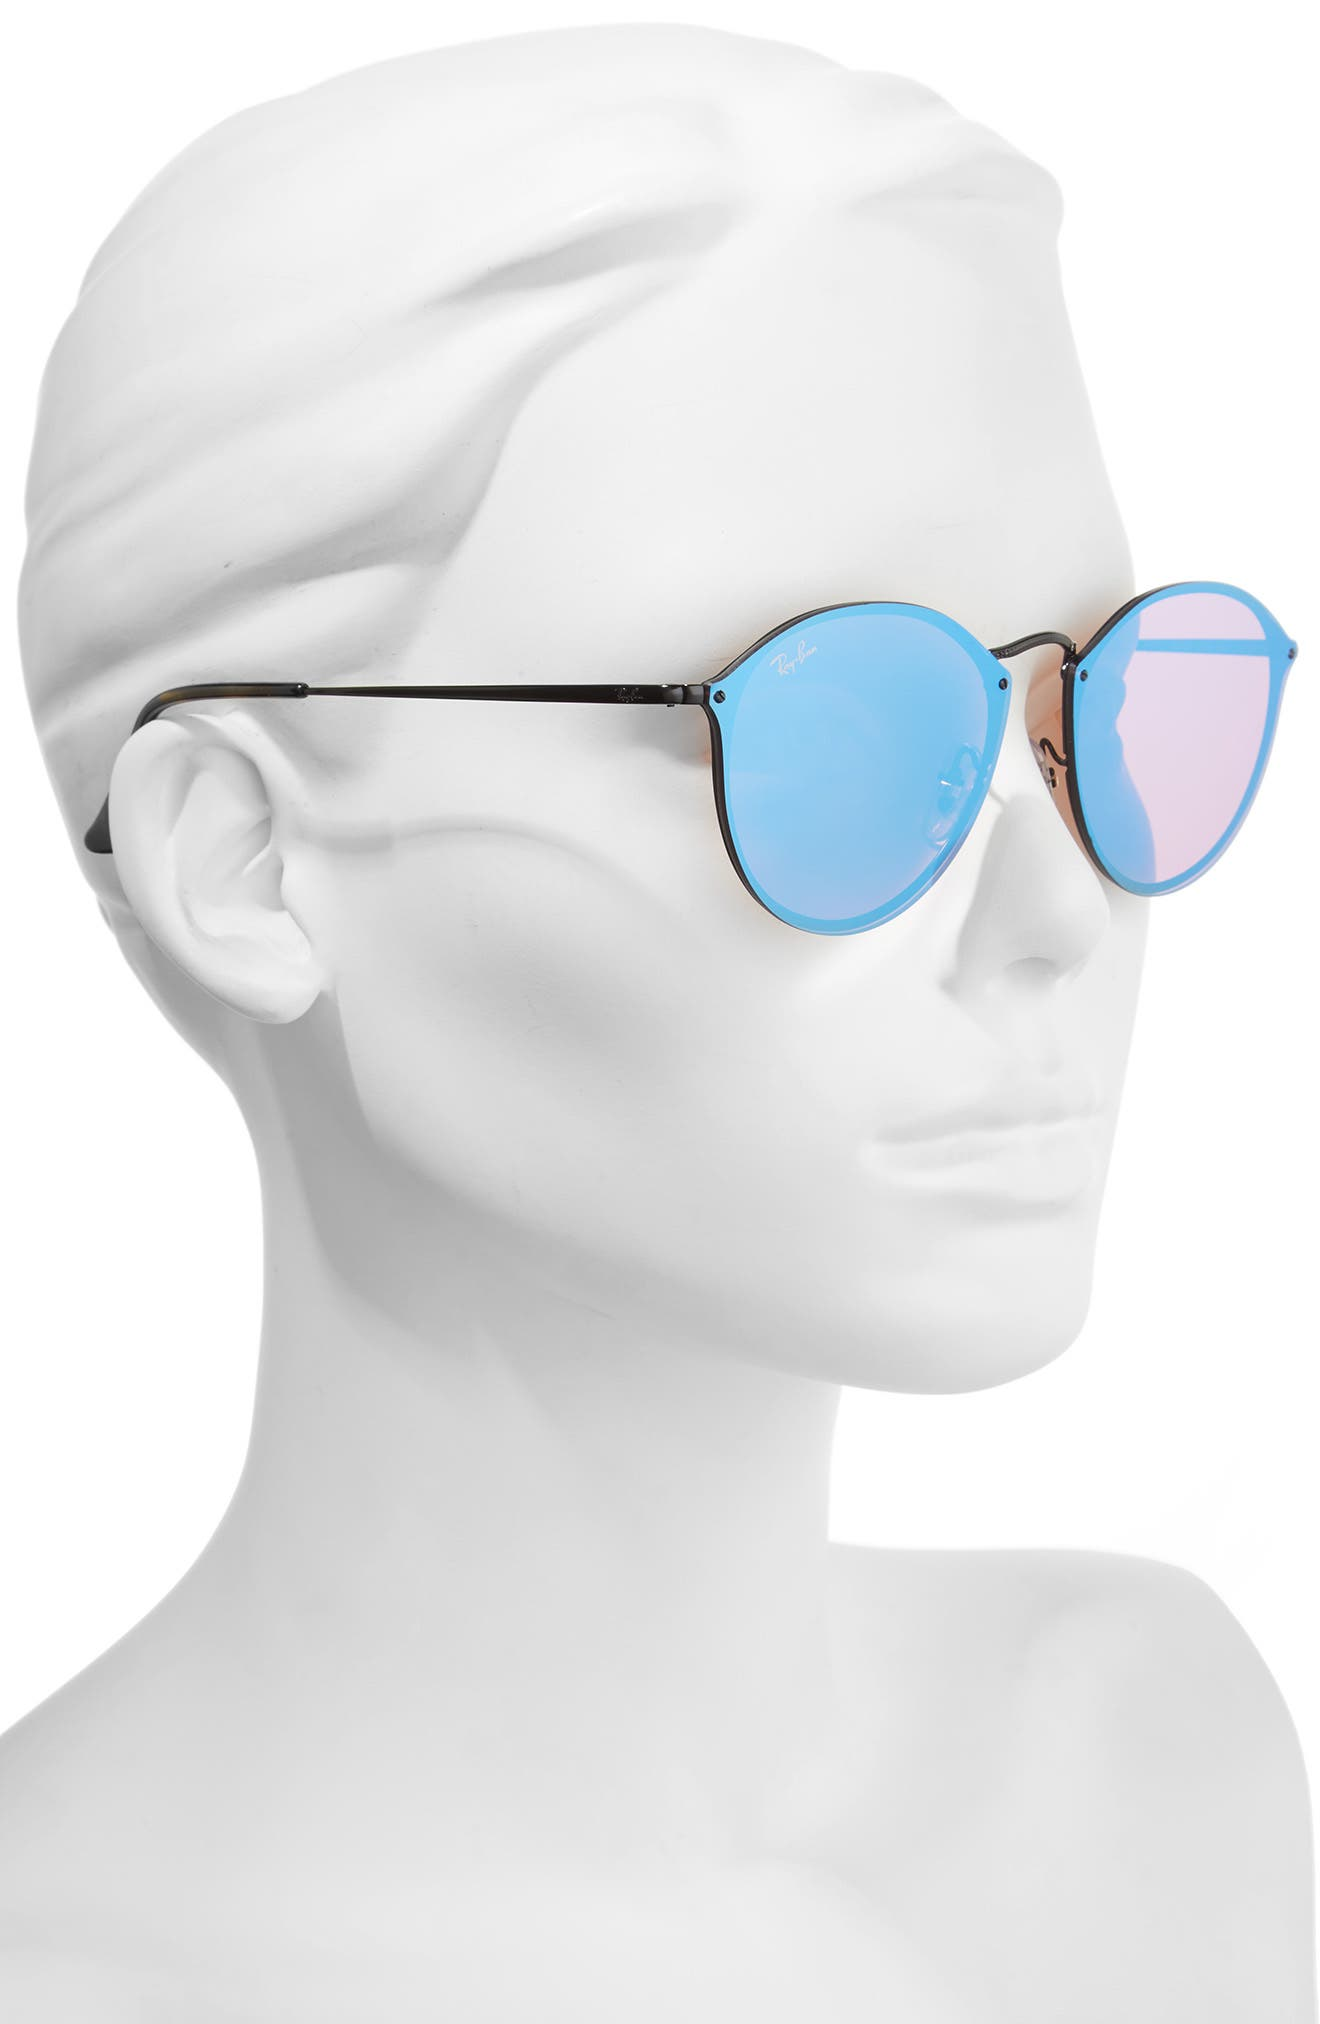 59mm Blaze Round Mirrored Sunglasses,                             Alternate thumbnail 2, color,                             001